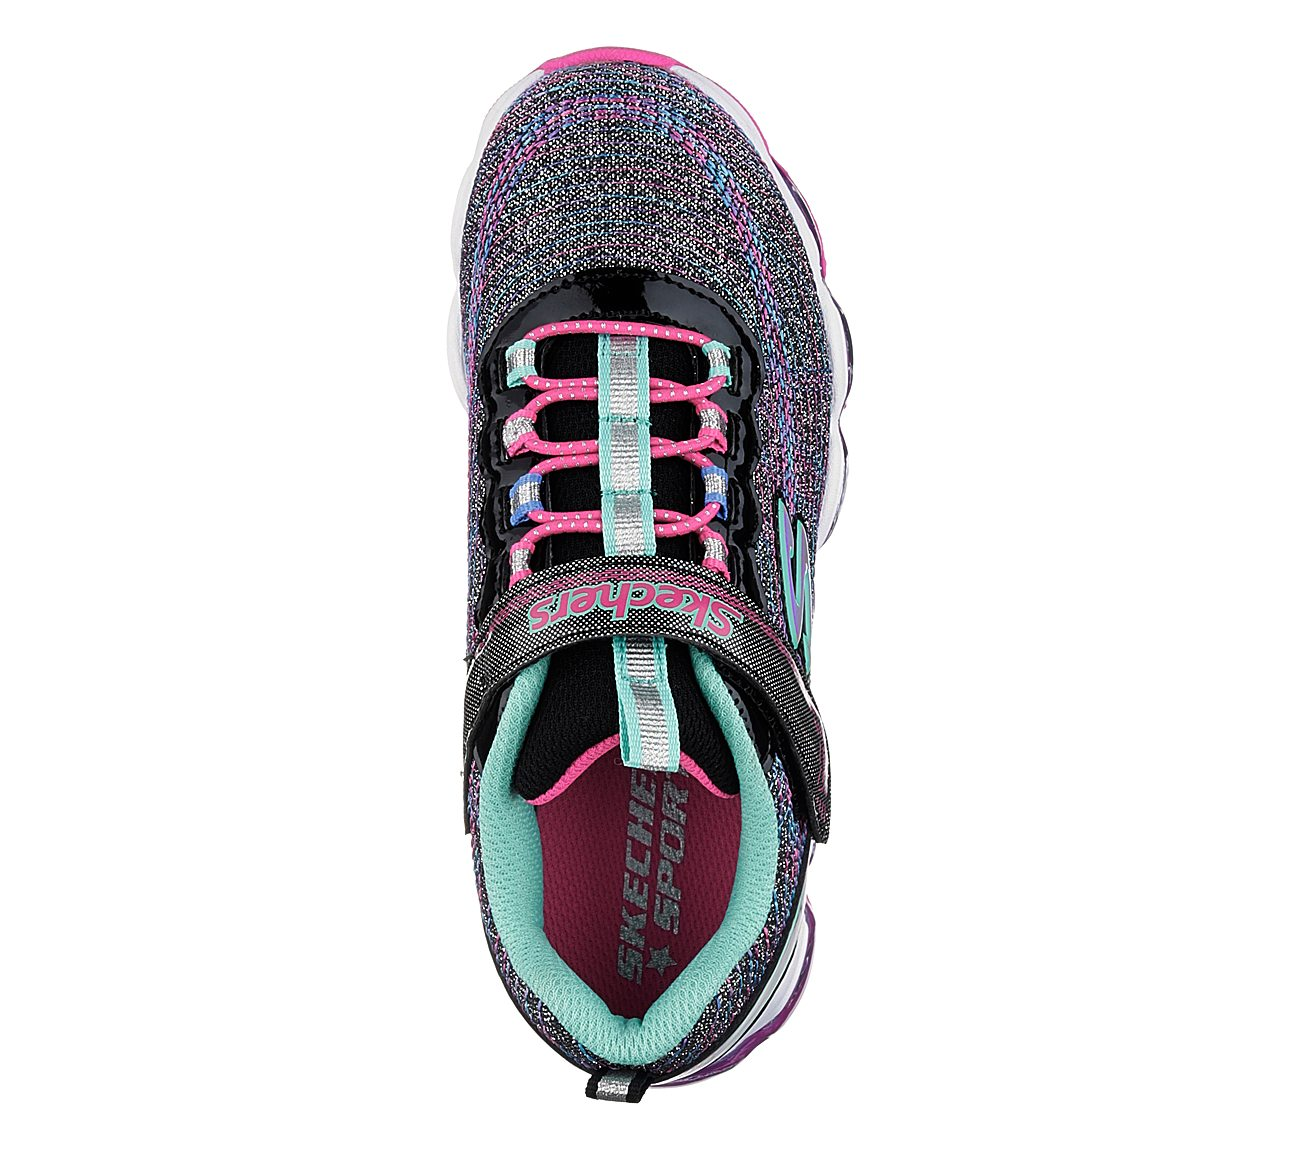 Air Lites SKECHERS S-Lights Shoes